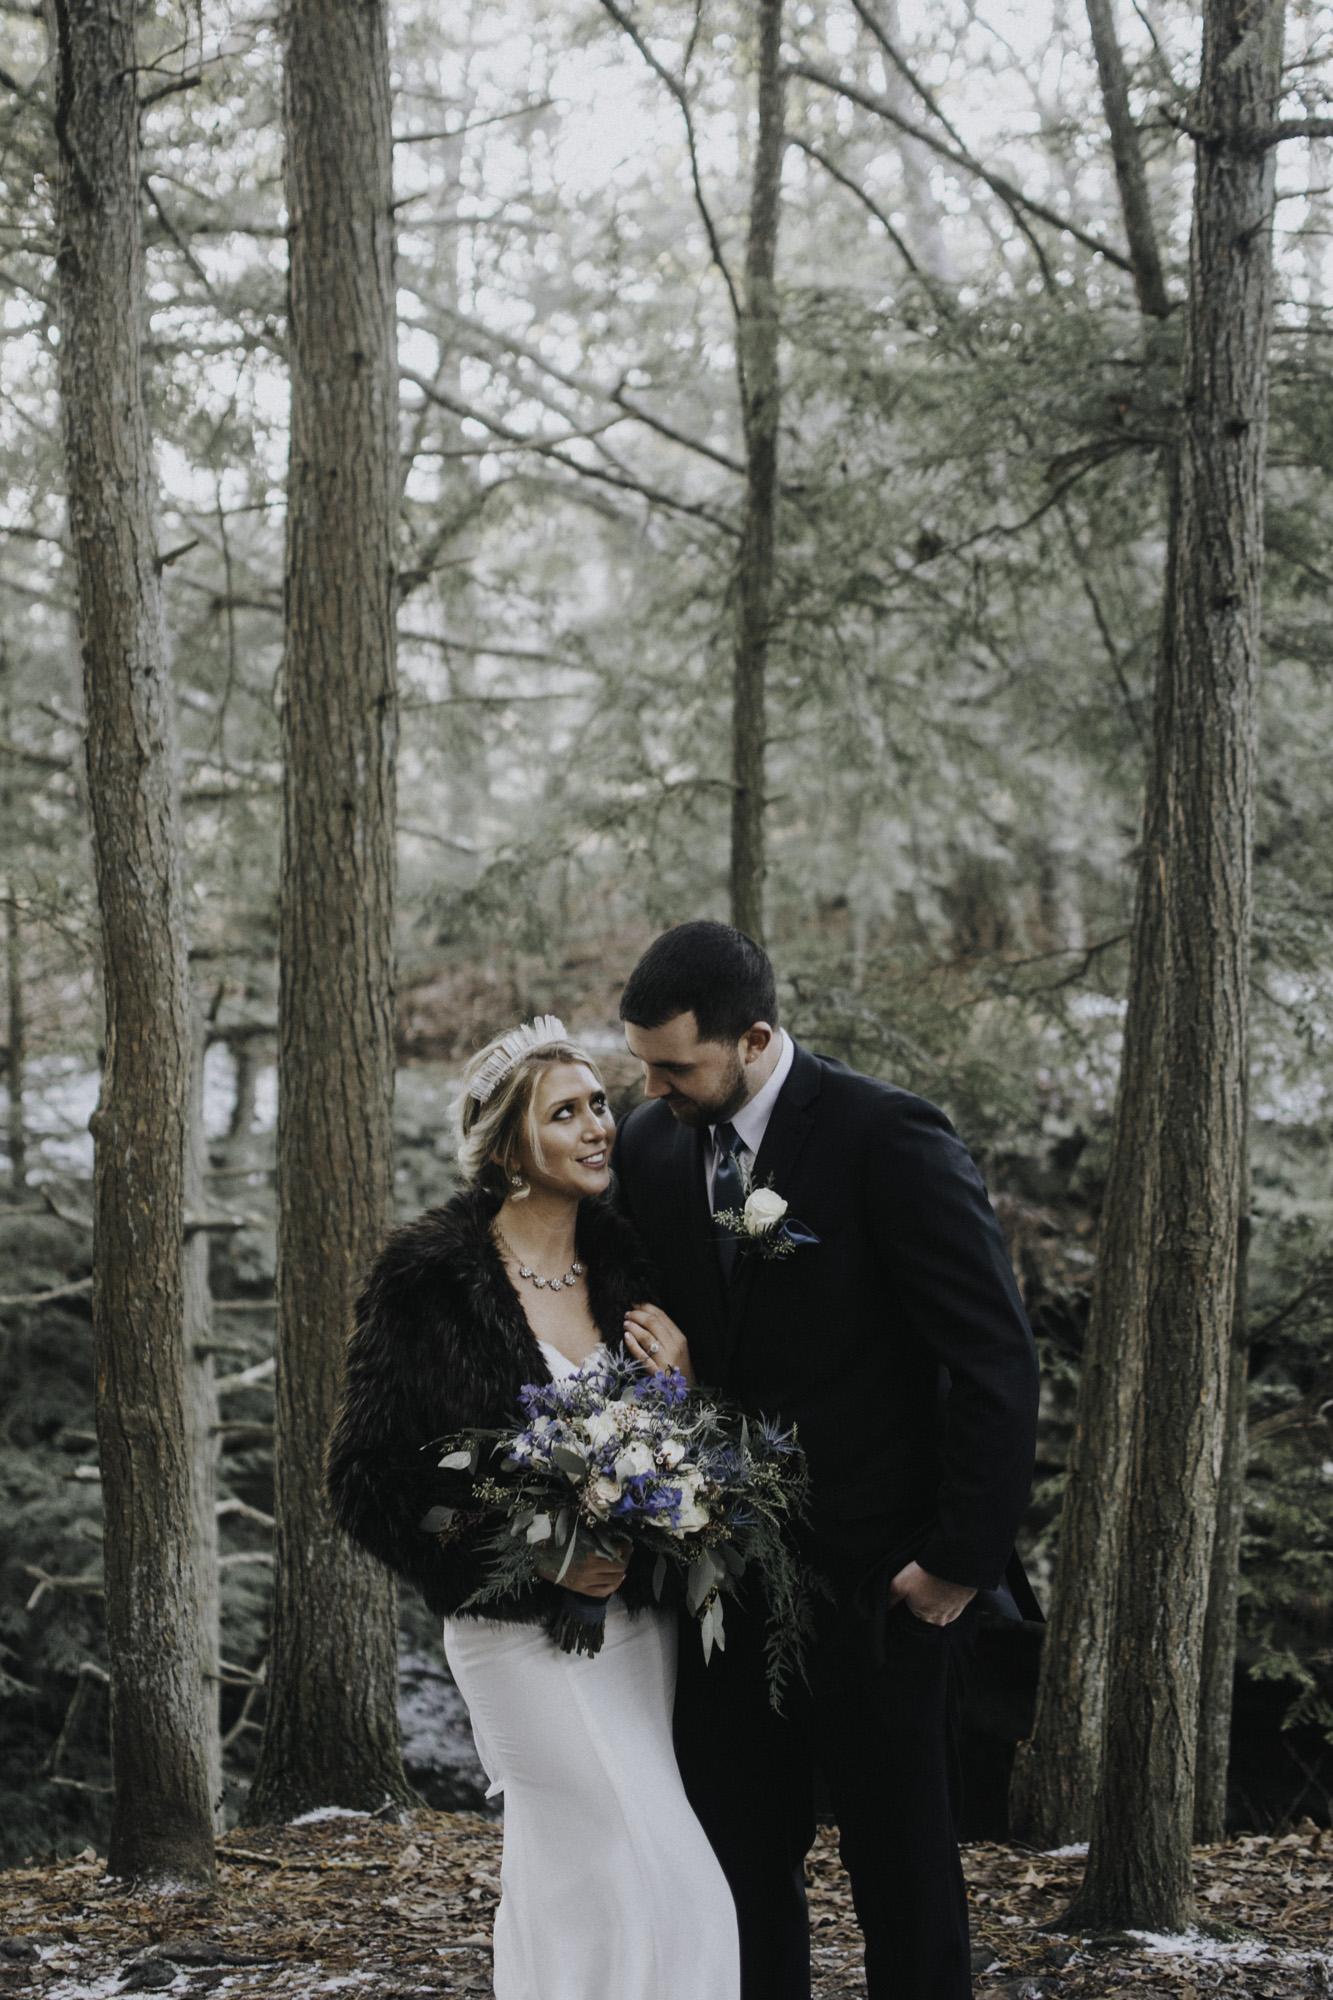 Cate_Ann_Photography_Dayton_Ohio_Wedding_Elopement_And_Engagement_PhotographerDSC_6090.jpg